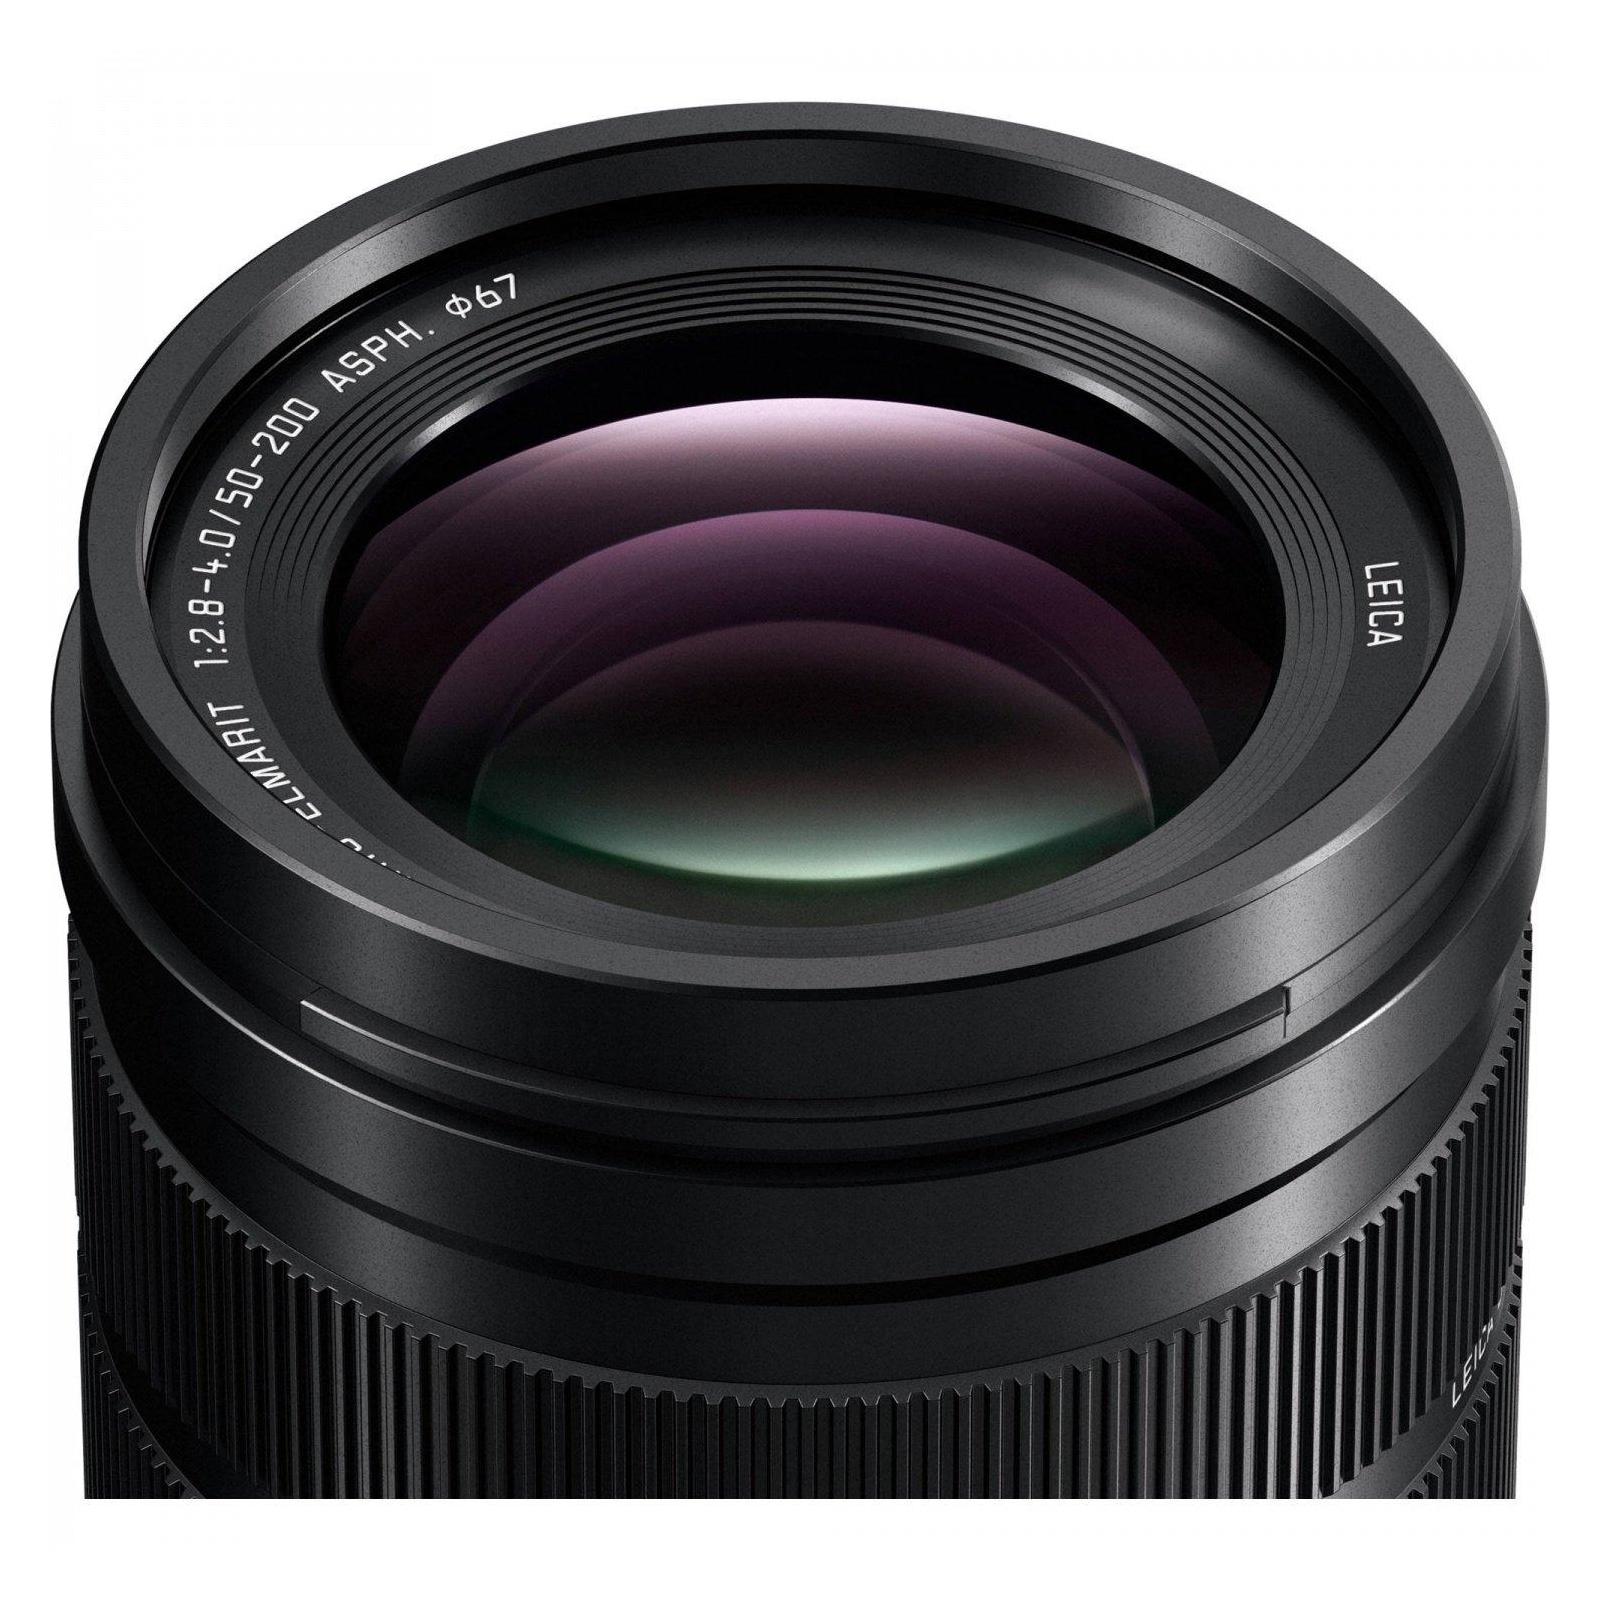 Объектив PANASONIC Micro 4/3 Lens 50-200 mm f/2.8-4 ASPH. POWER O.I.S. Leica DG (H-ES50200E) изображение 10